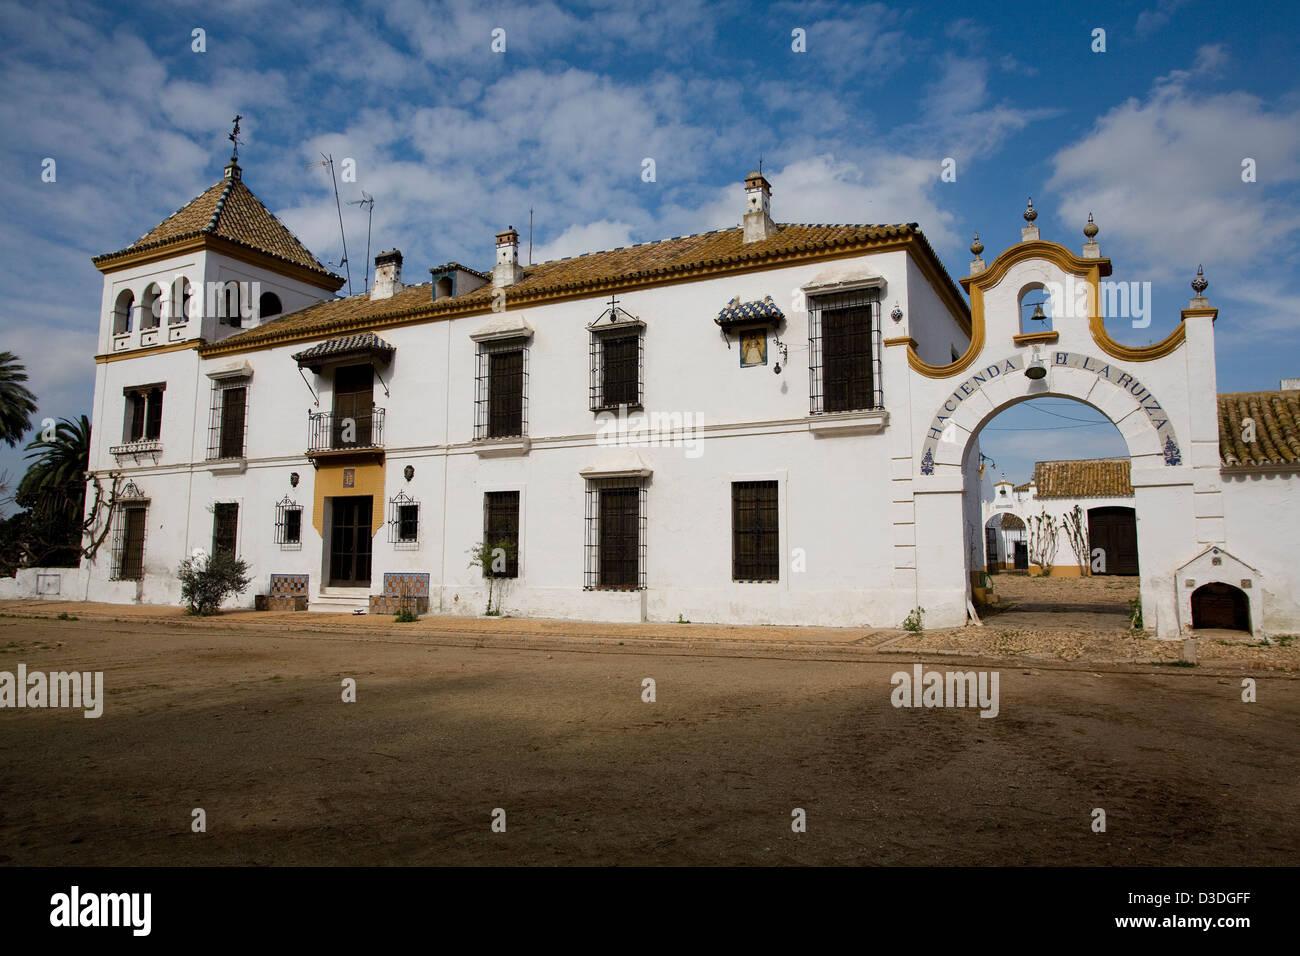 LA RUIZA FINCA, HUELVA, SPAIN, 21st FEBRUAY 2008: The large 19th century mansion of the Prieto de la Cal family Stock Photo